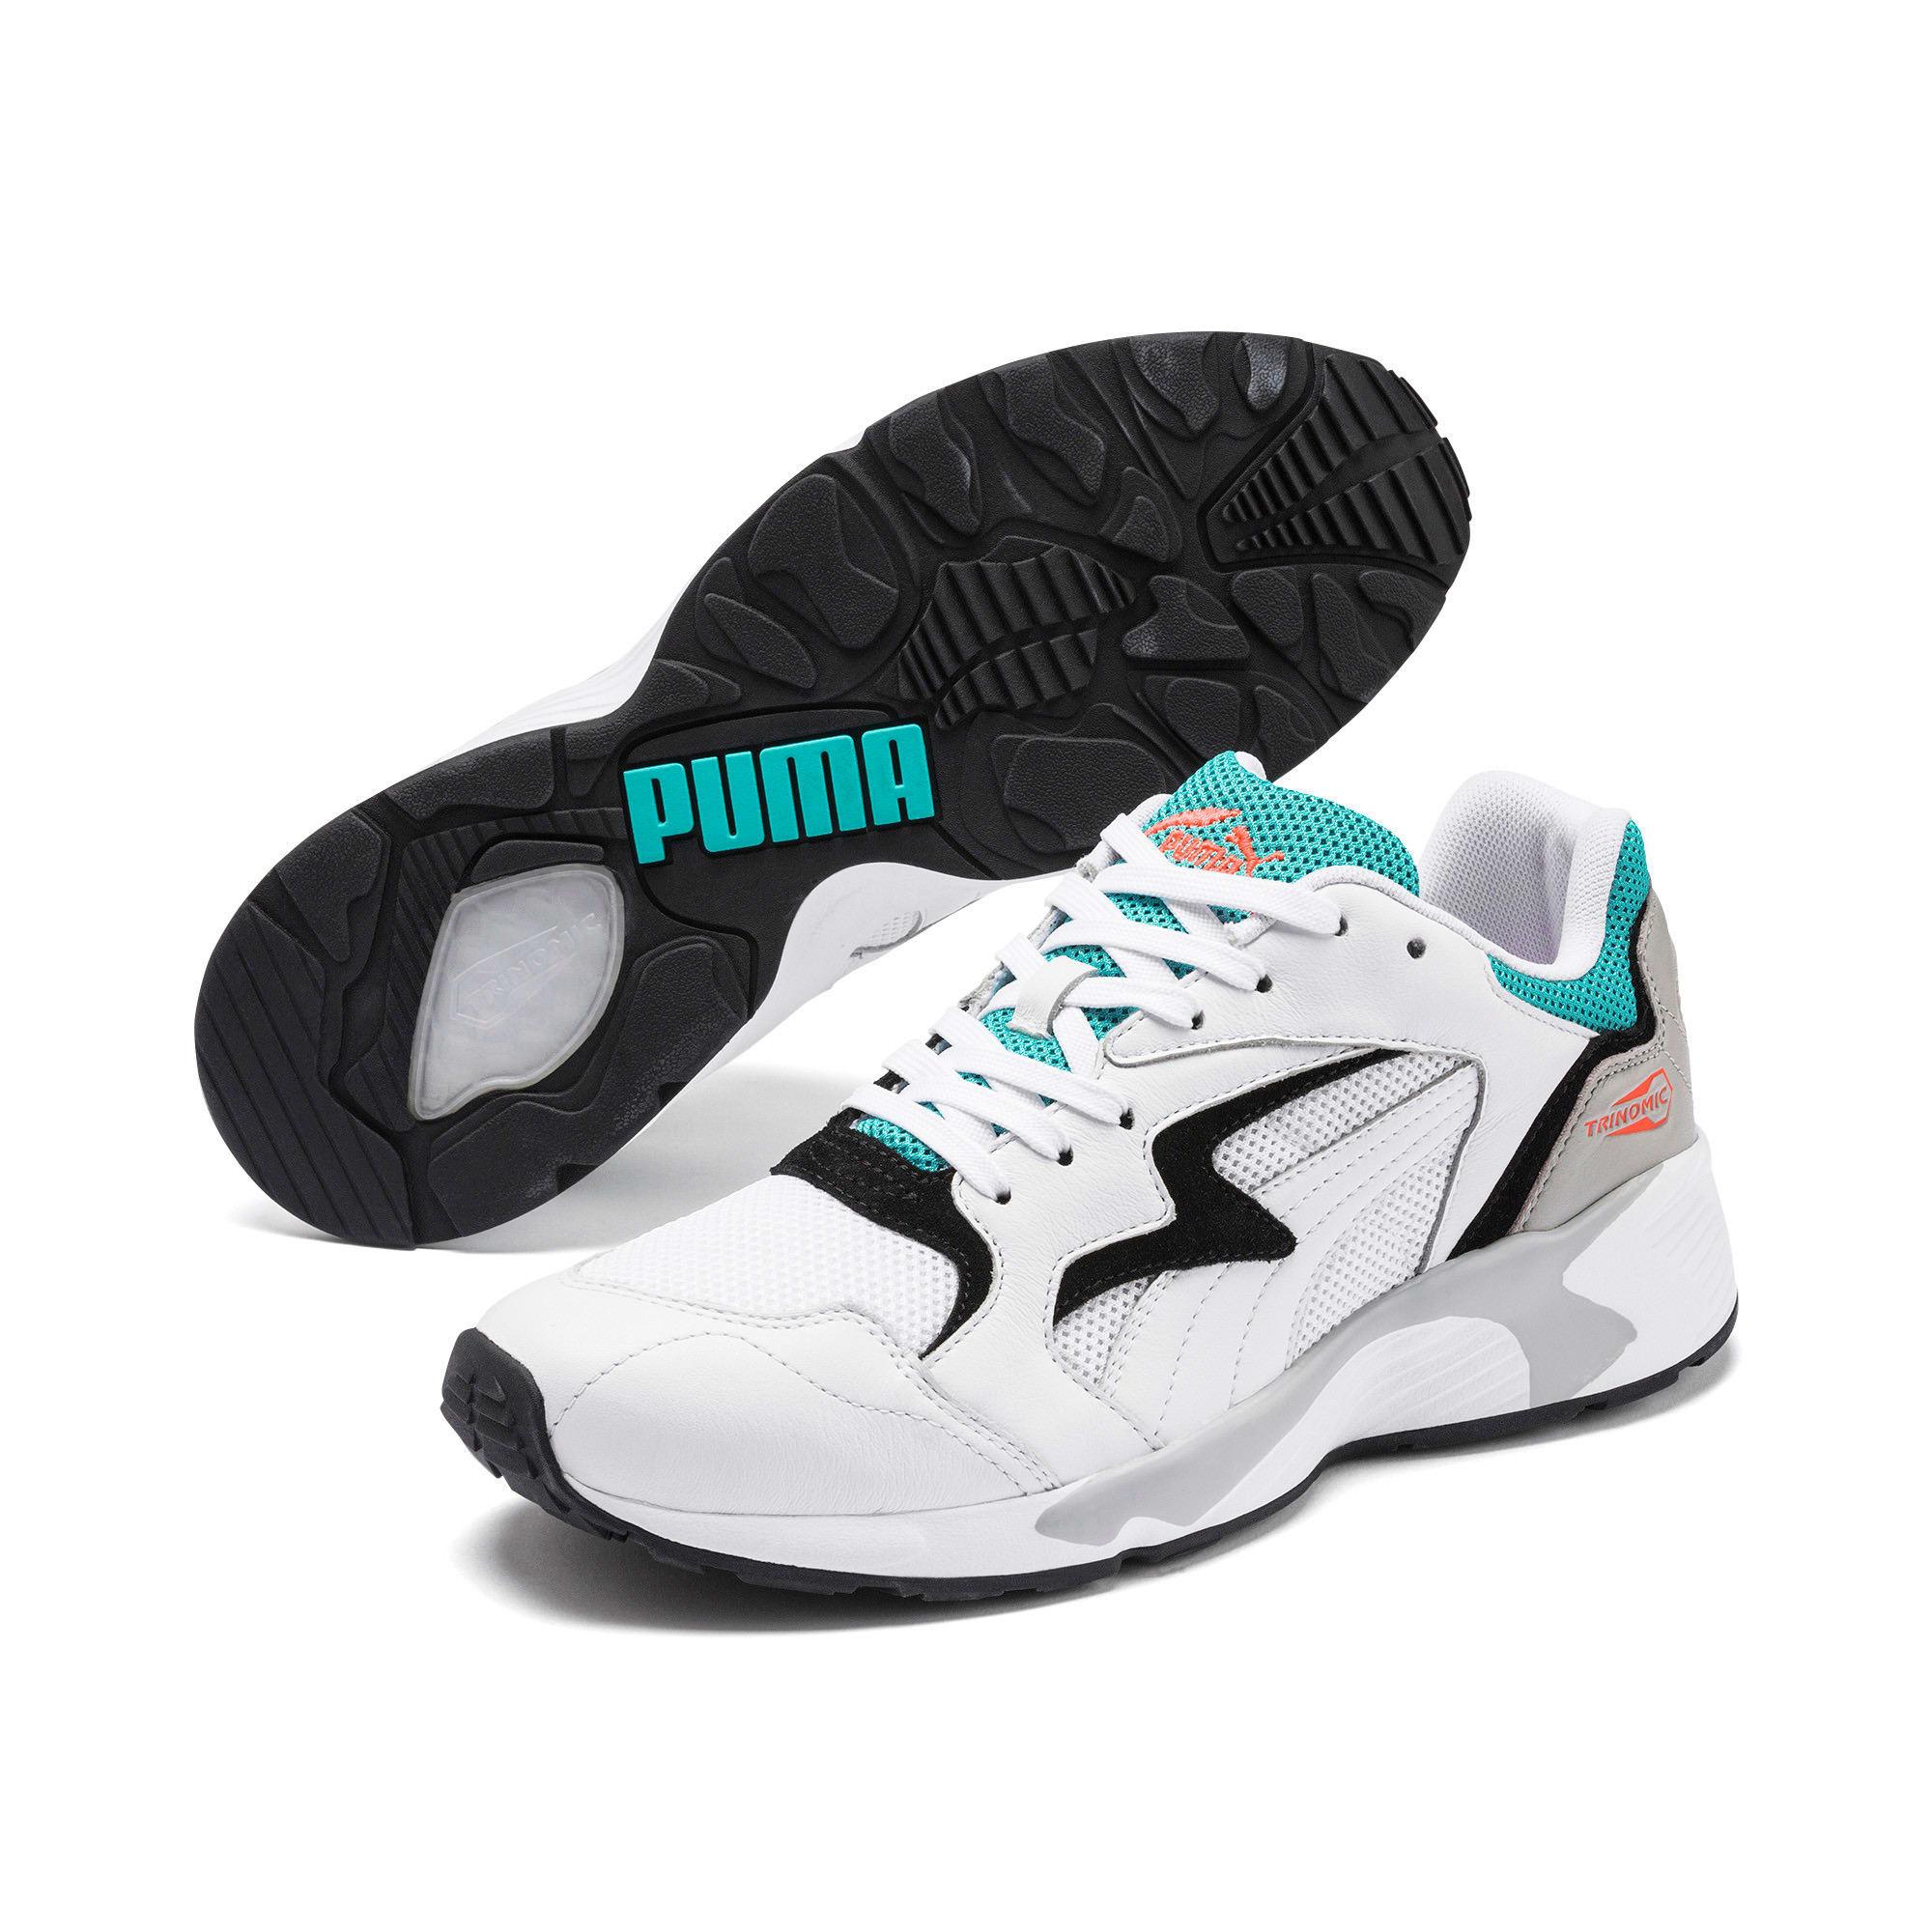 Thumbnail 2 of Prevail Classic Sneakers, Puma White-Blue Turquoise, medium